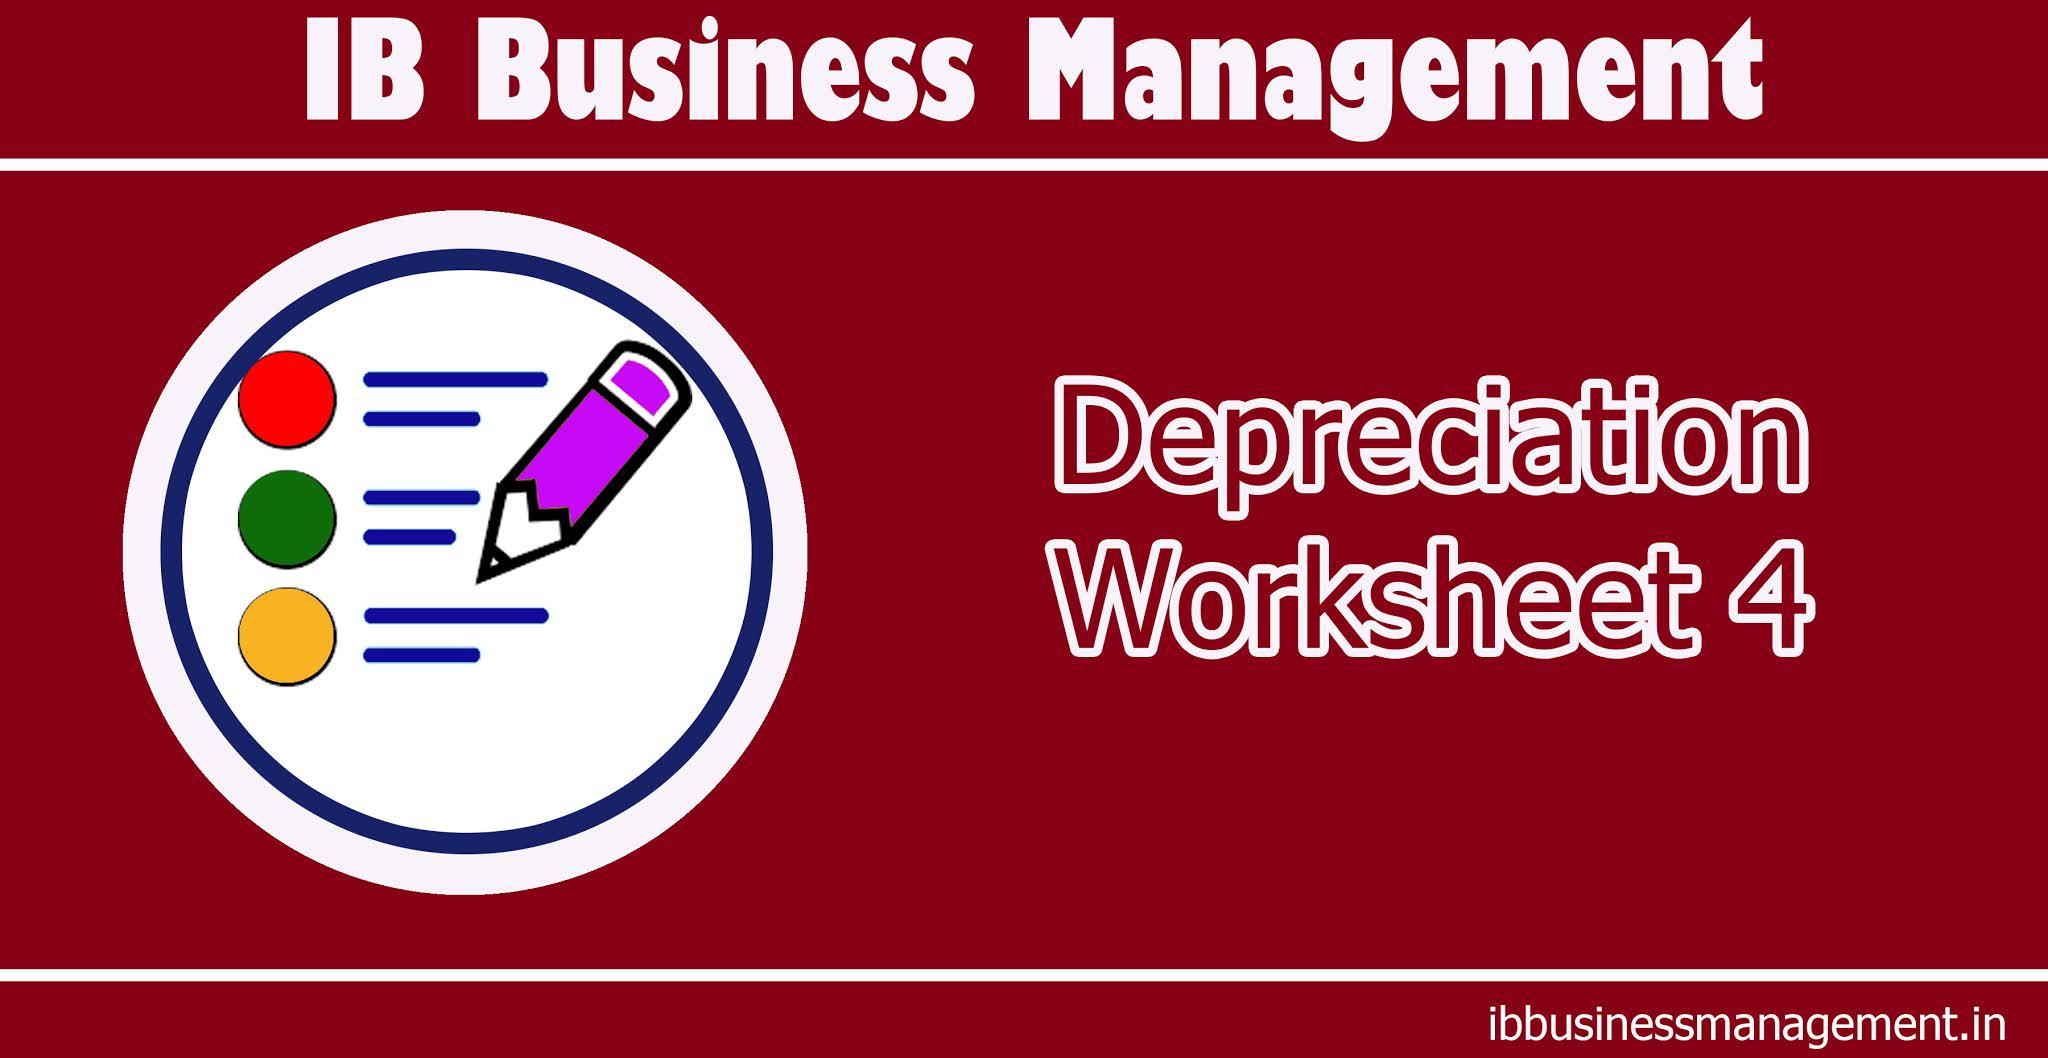 IB Business Management   Depreciation worksheet 4